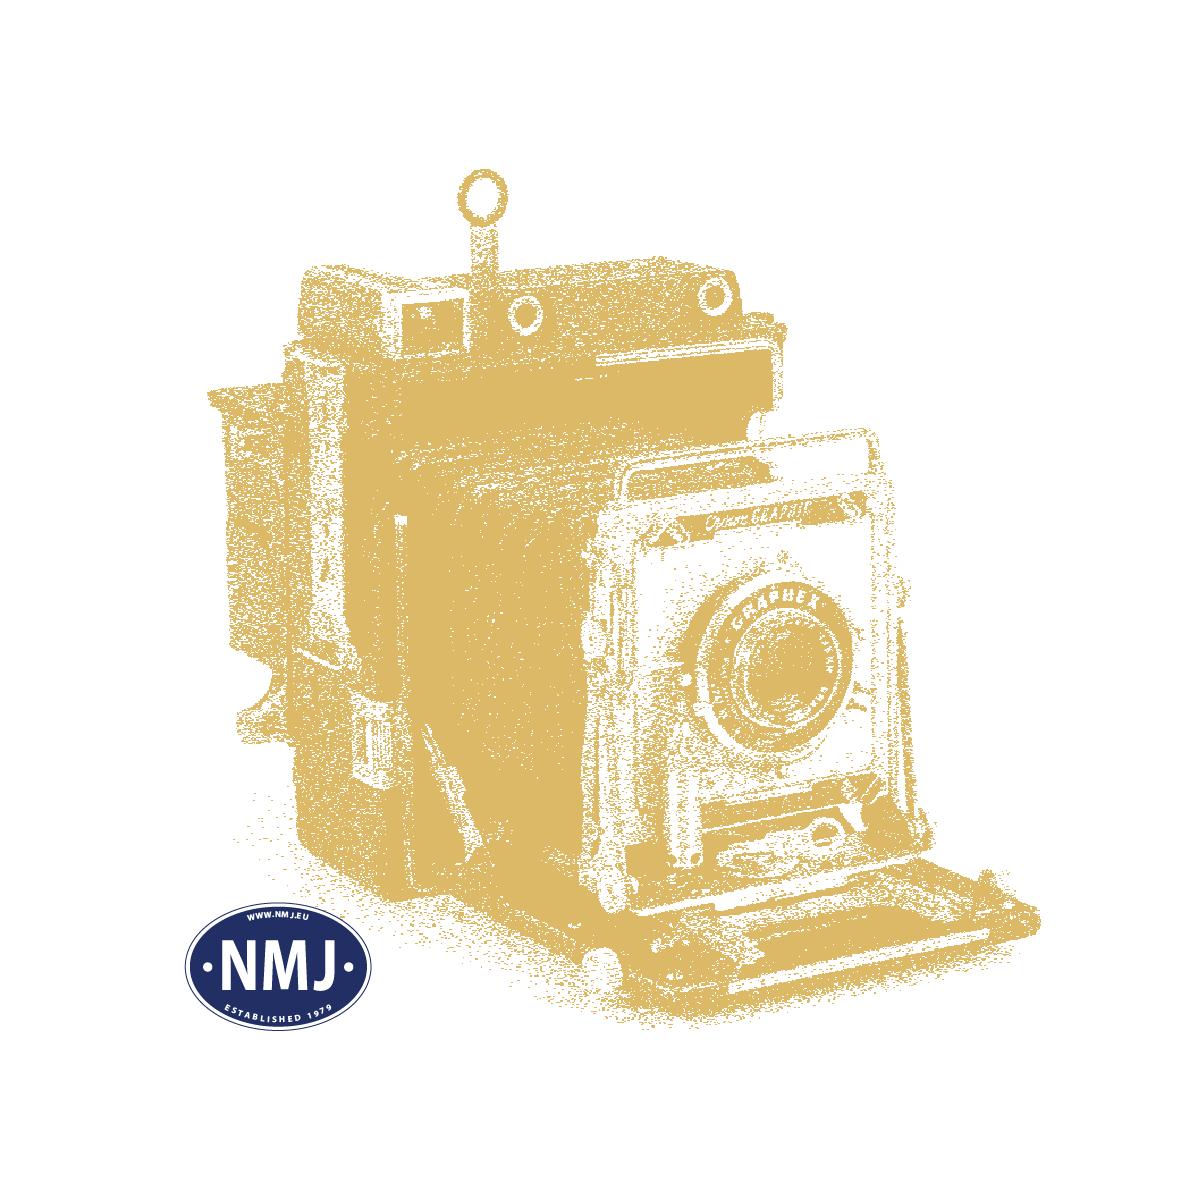 NMJT94103 - NMJ Topline NSB El14 2181, Mellomdesign, DCC m/ Lyd